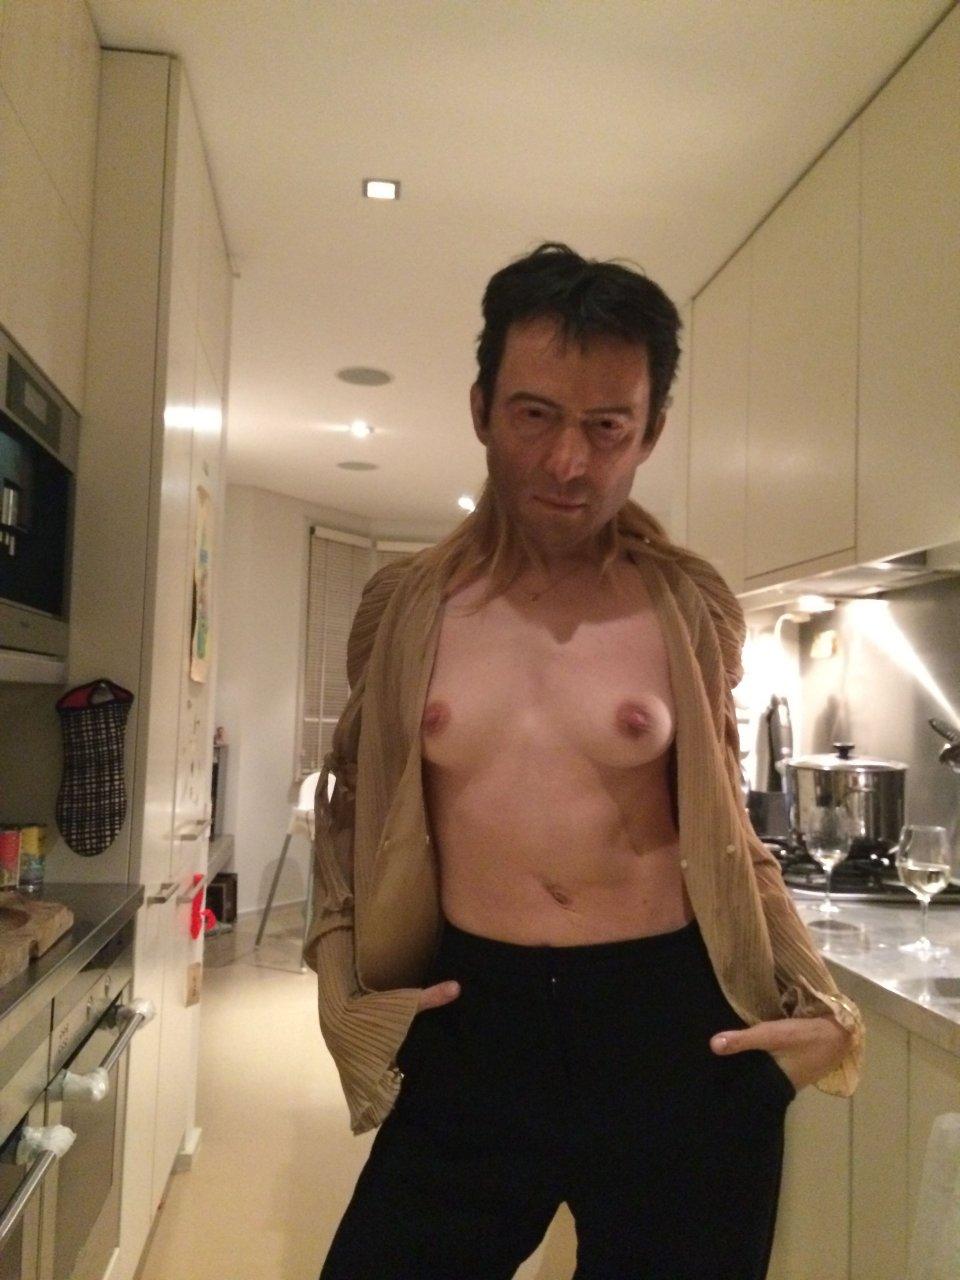 Amateur erotic free picture